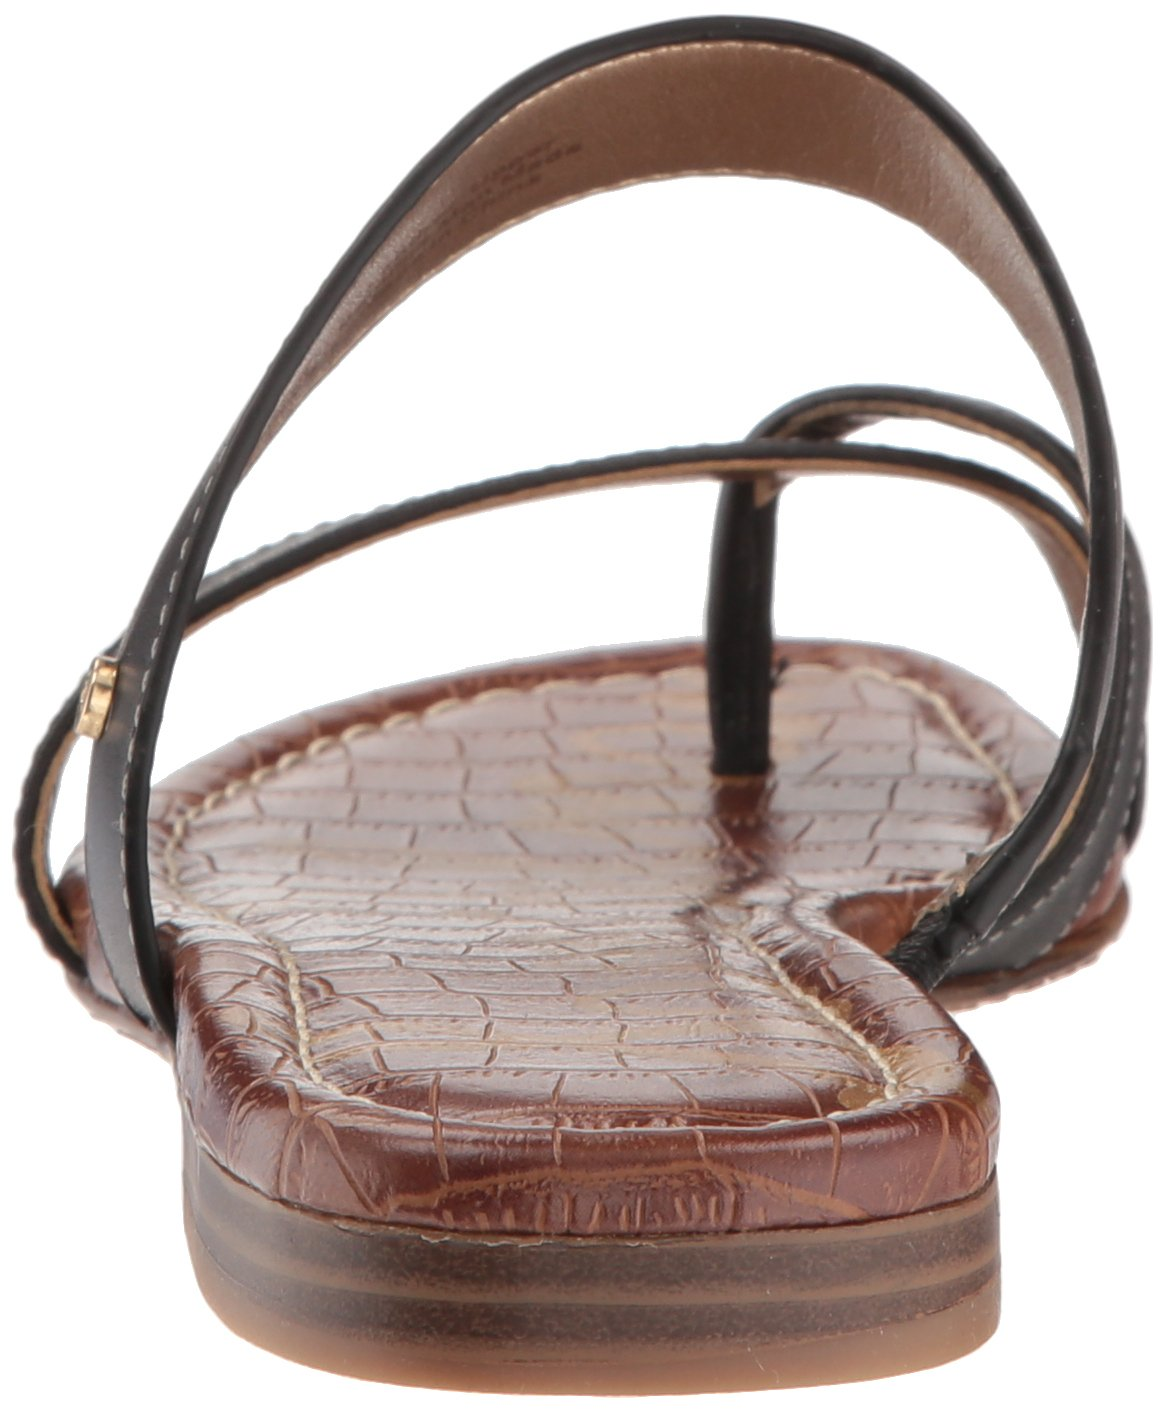 Sam Edelman Women's Bernice Slide Sandal B078HQCH3D 8.5 B(M) US|Black Leather